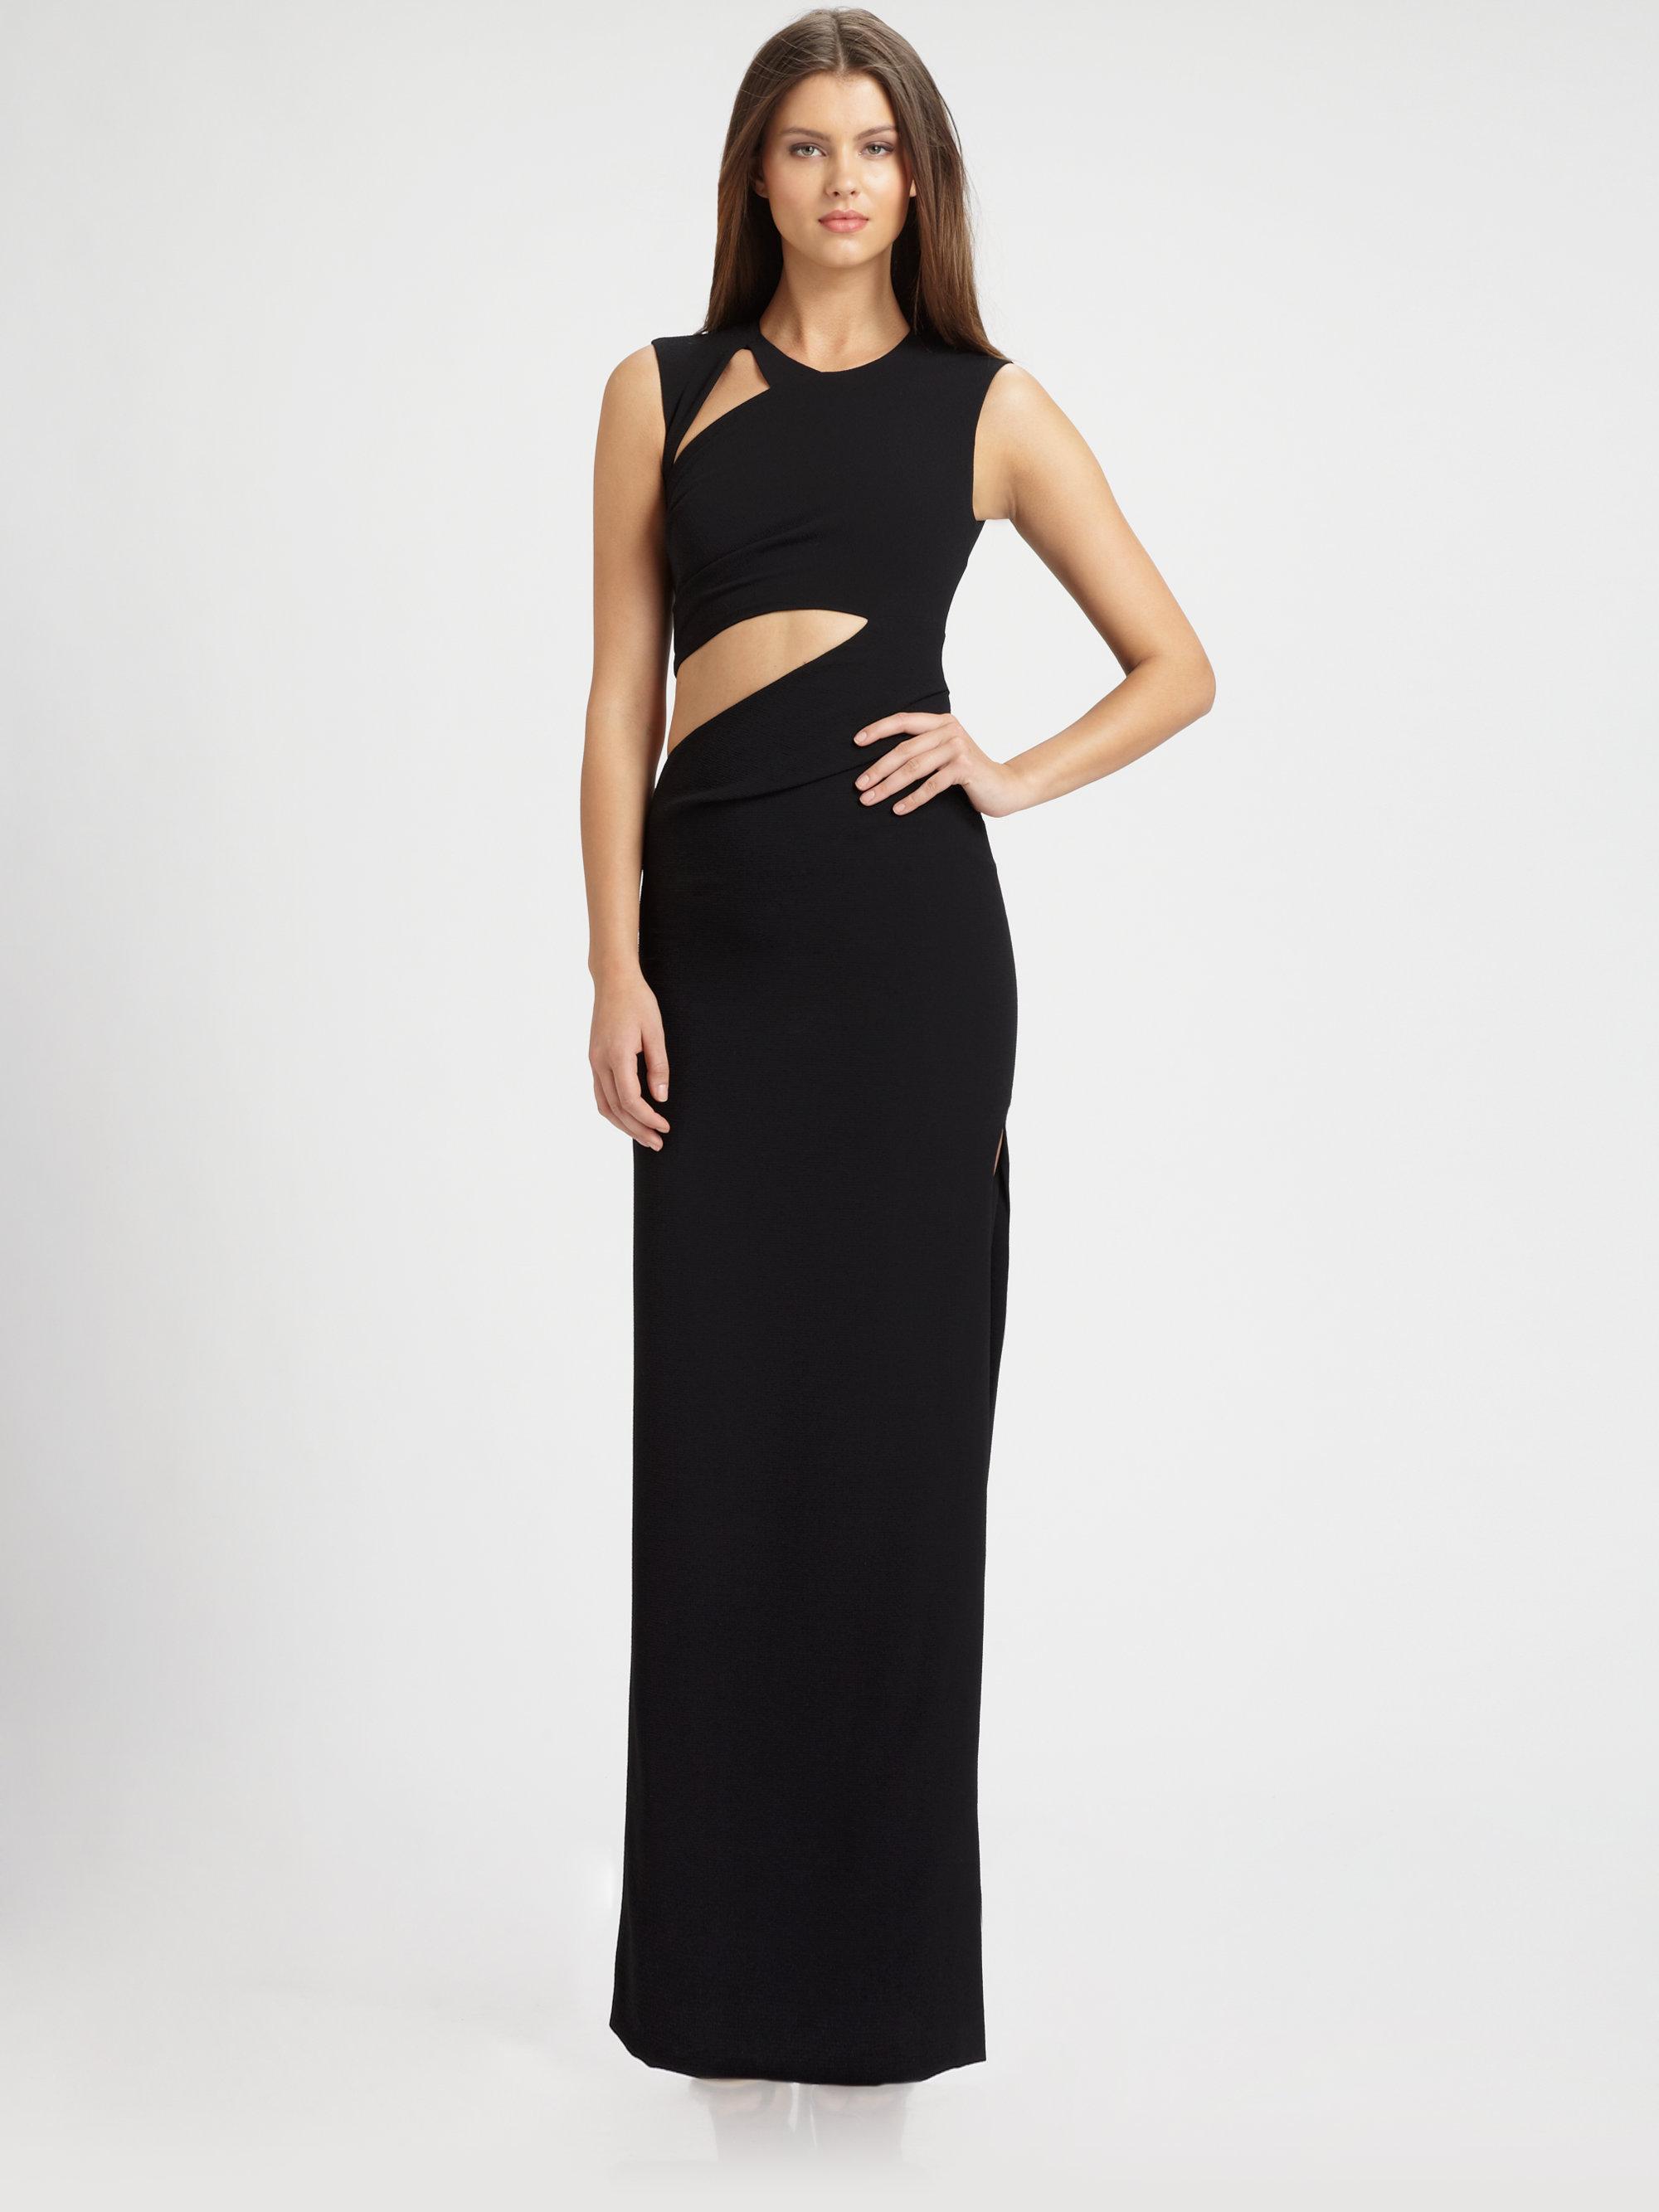 Lyst - Bcbgmaxazria Kimora Cutout Gown in Black